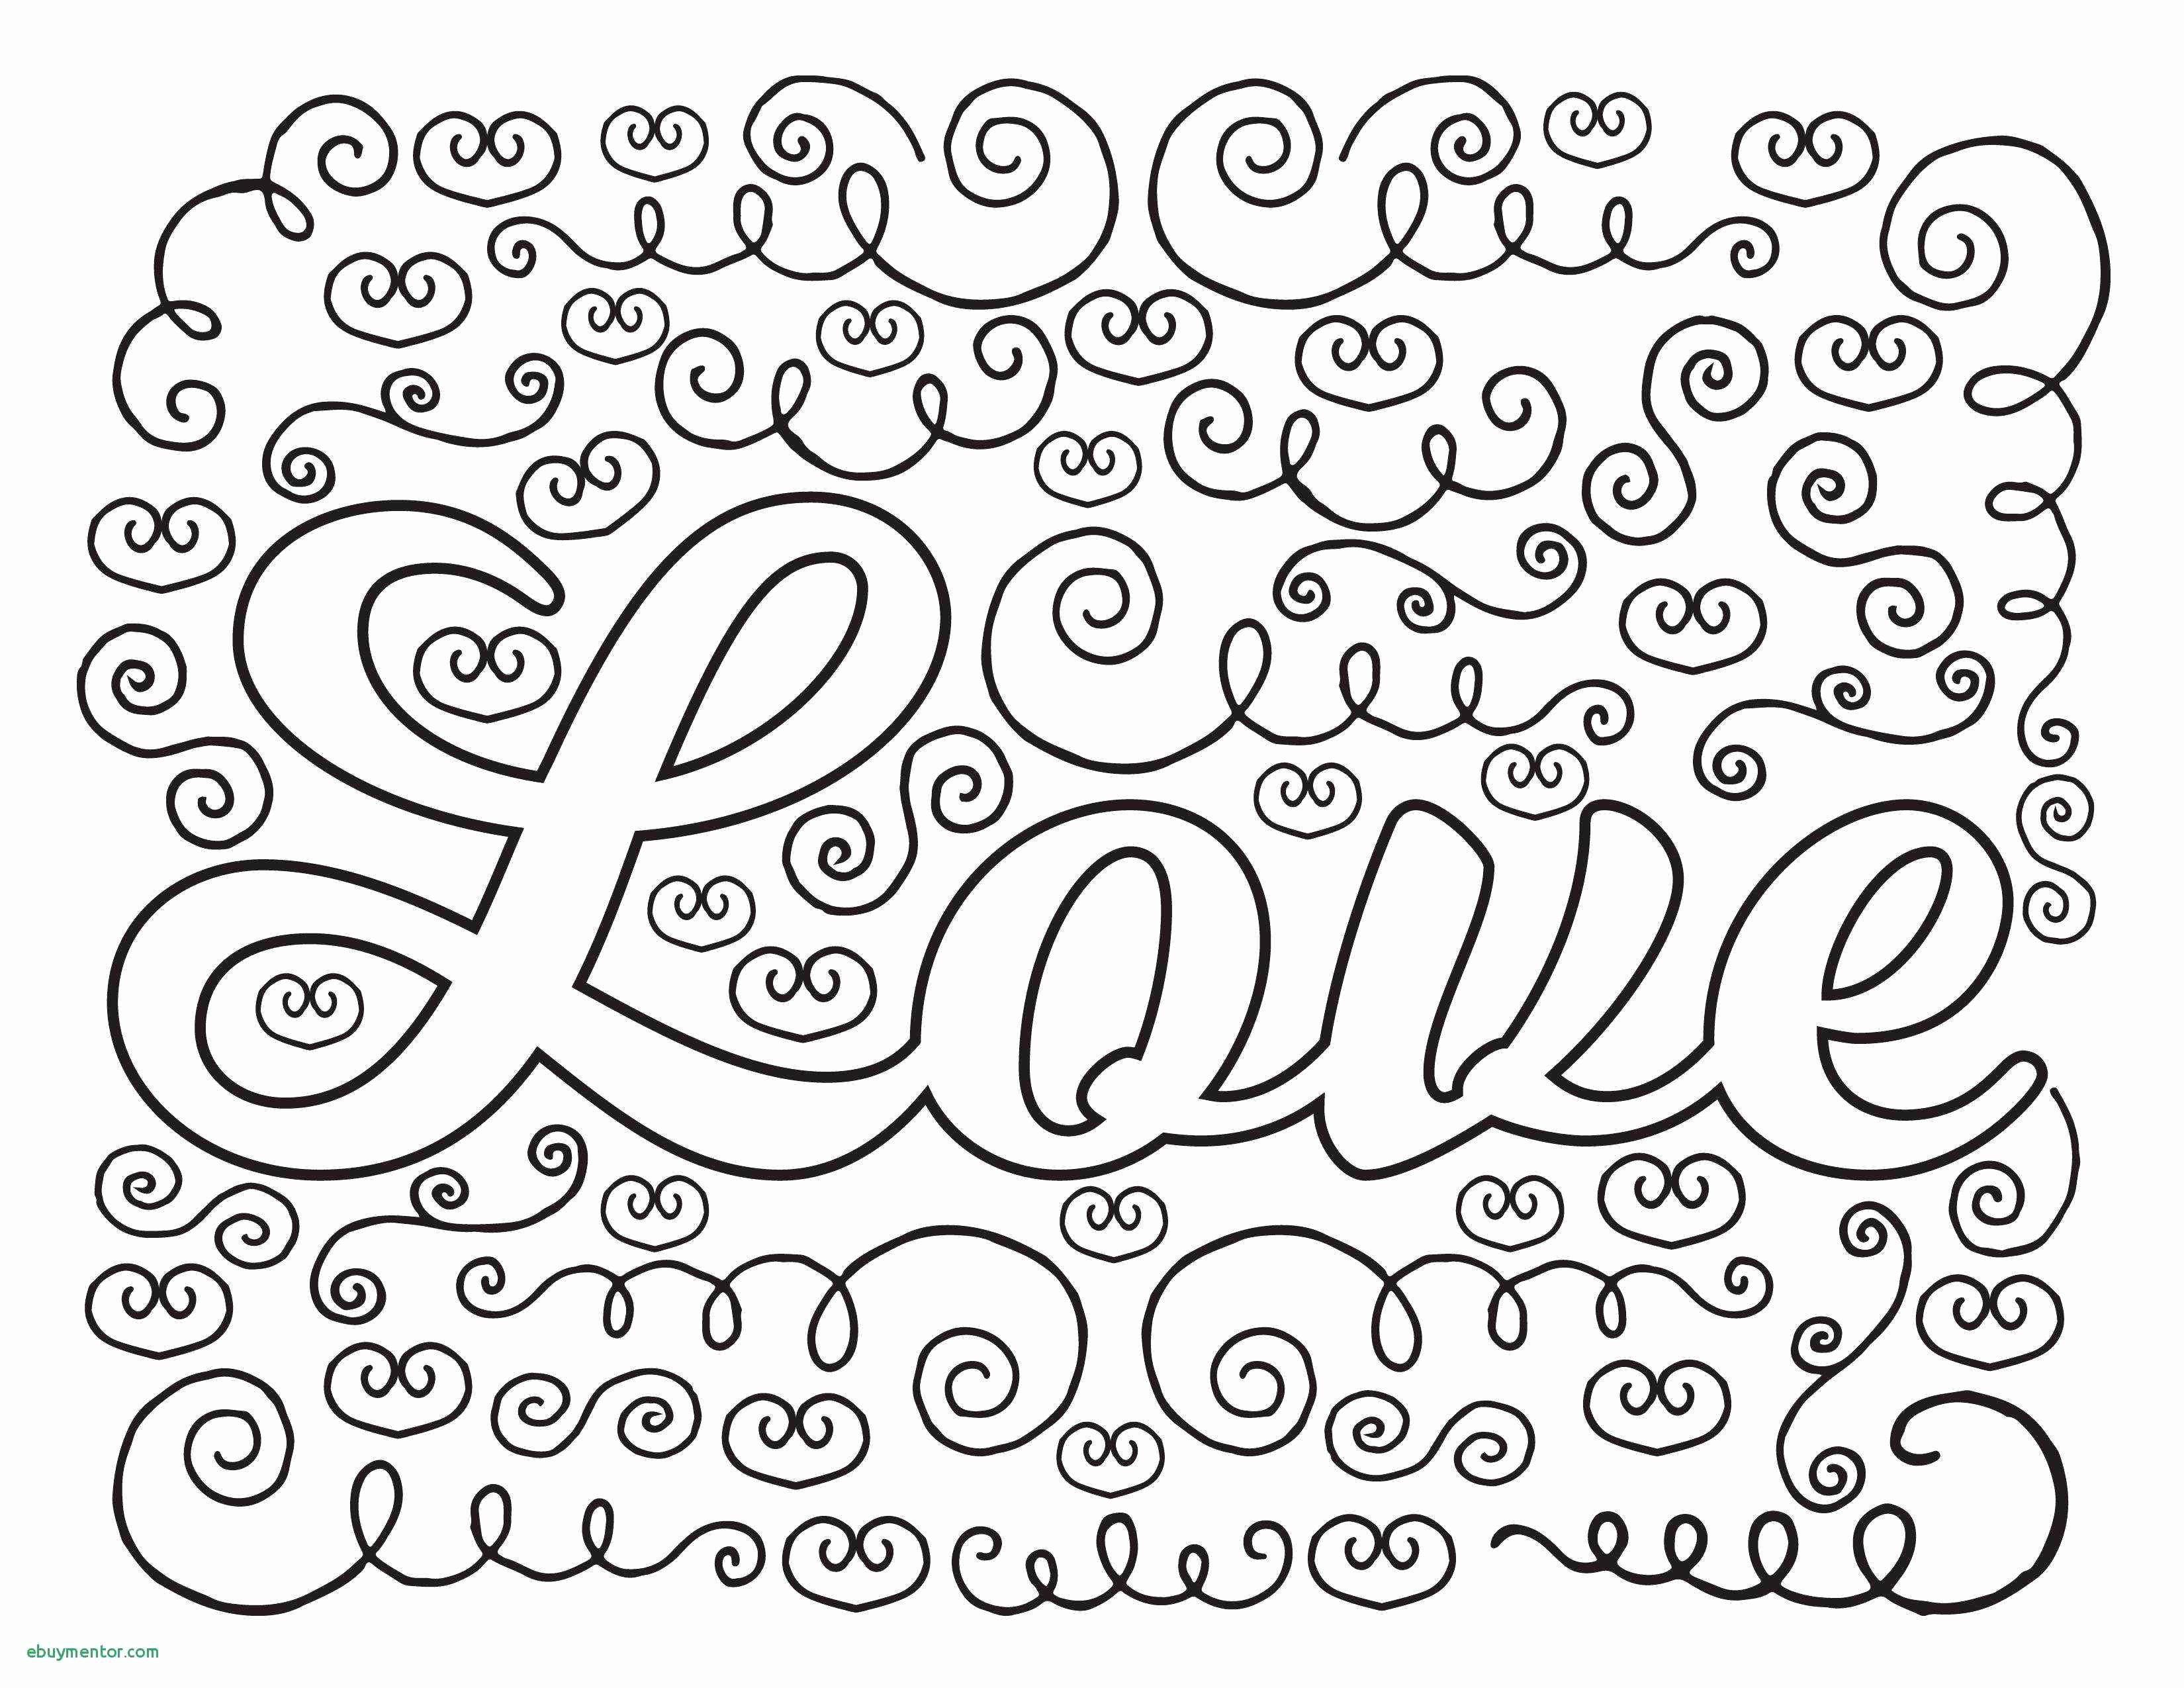 Pin By Erka Erdenetuya On Bb Love Coloring Pages Valentine Coloring Pages Heart Coloring Pages